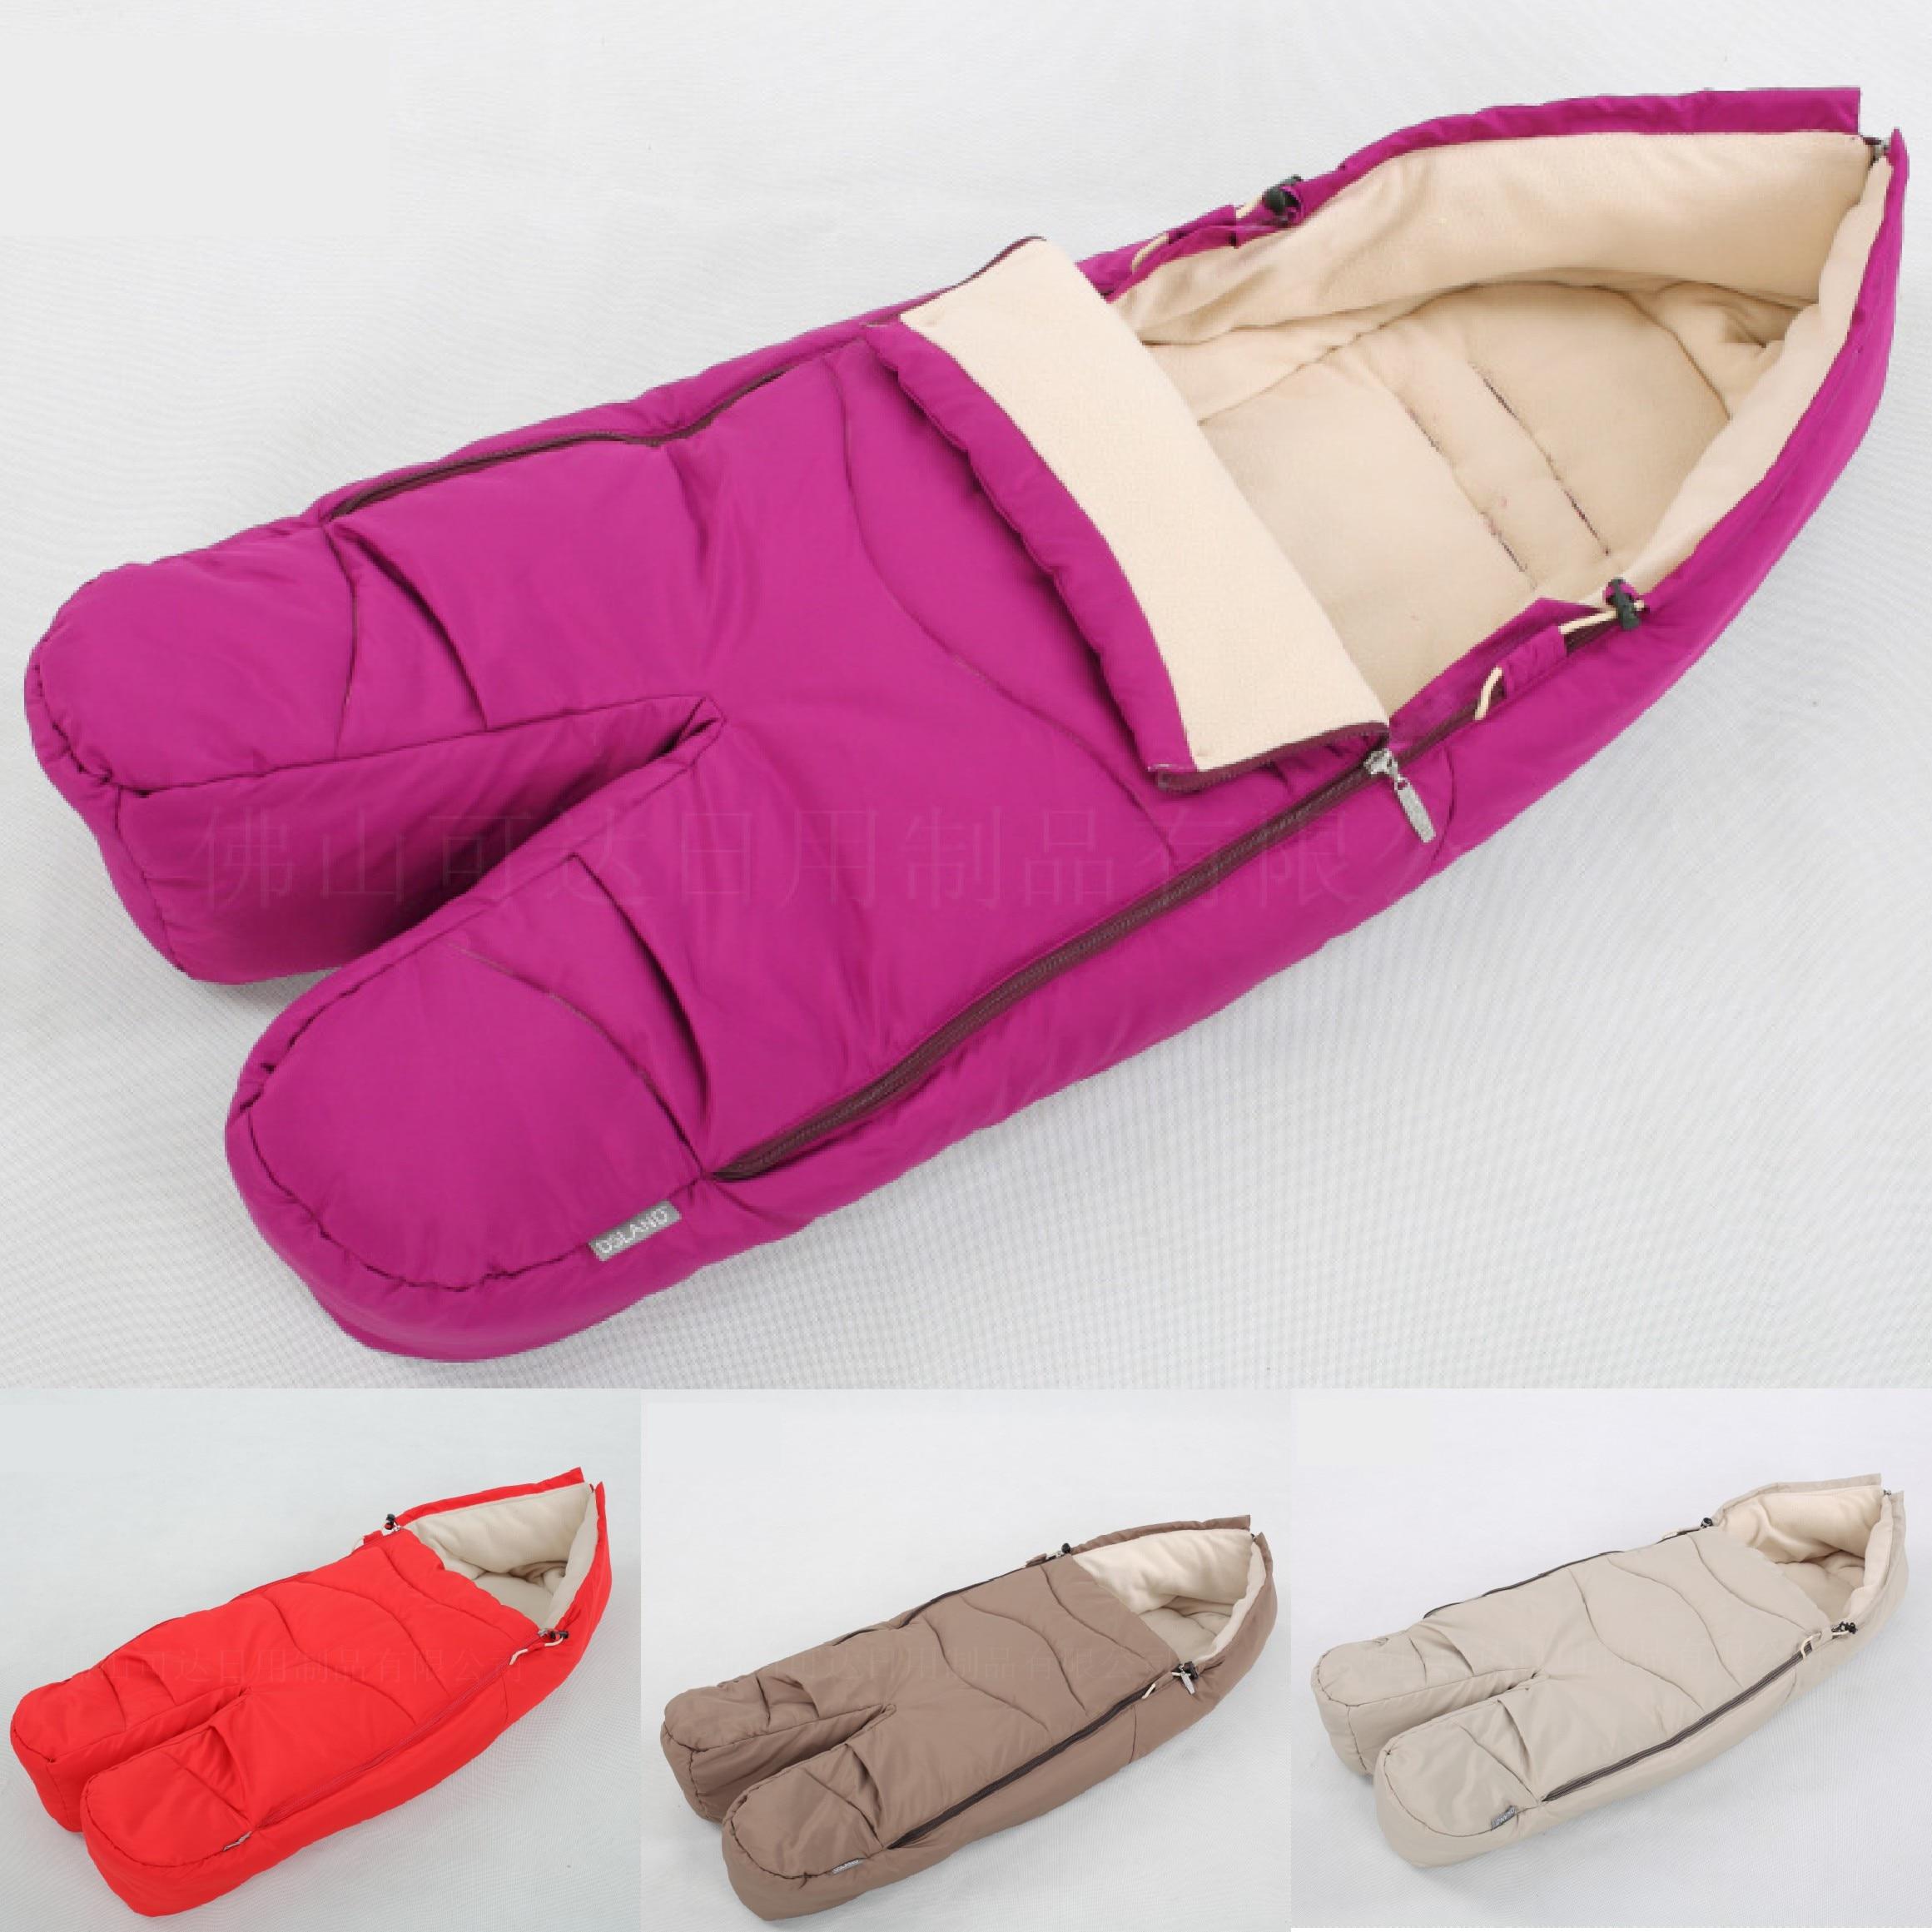 Winter Warm Dsland  stokke stroller   sleeping bag Foot Muff  Set Cover socks  Stroller